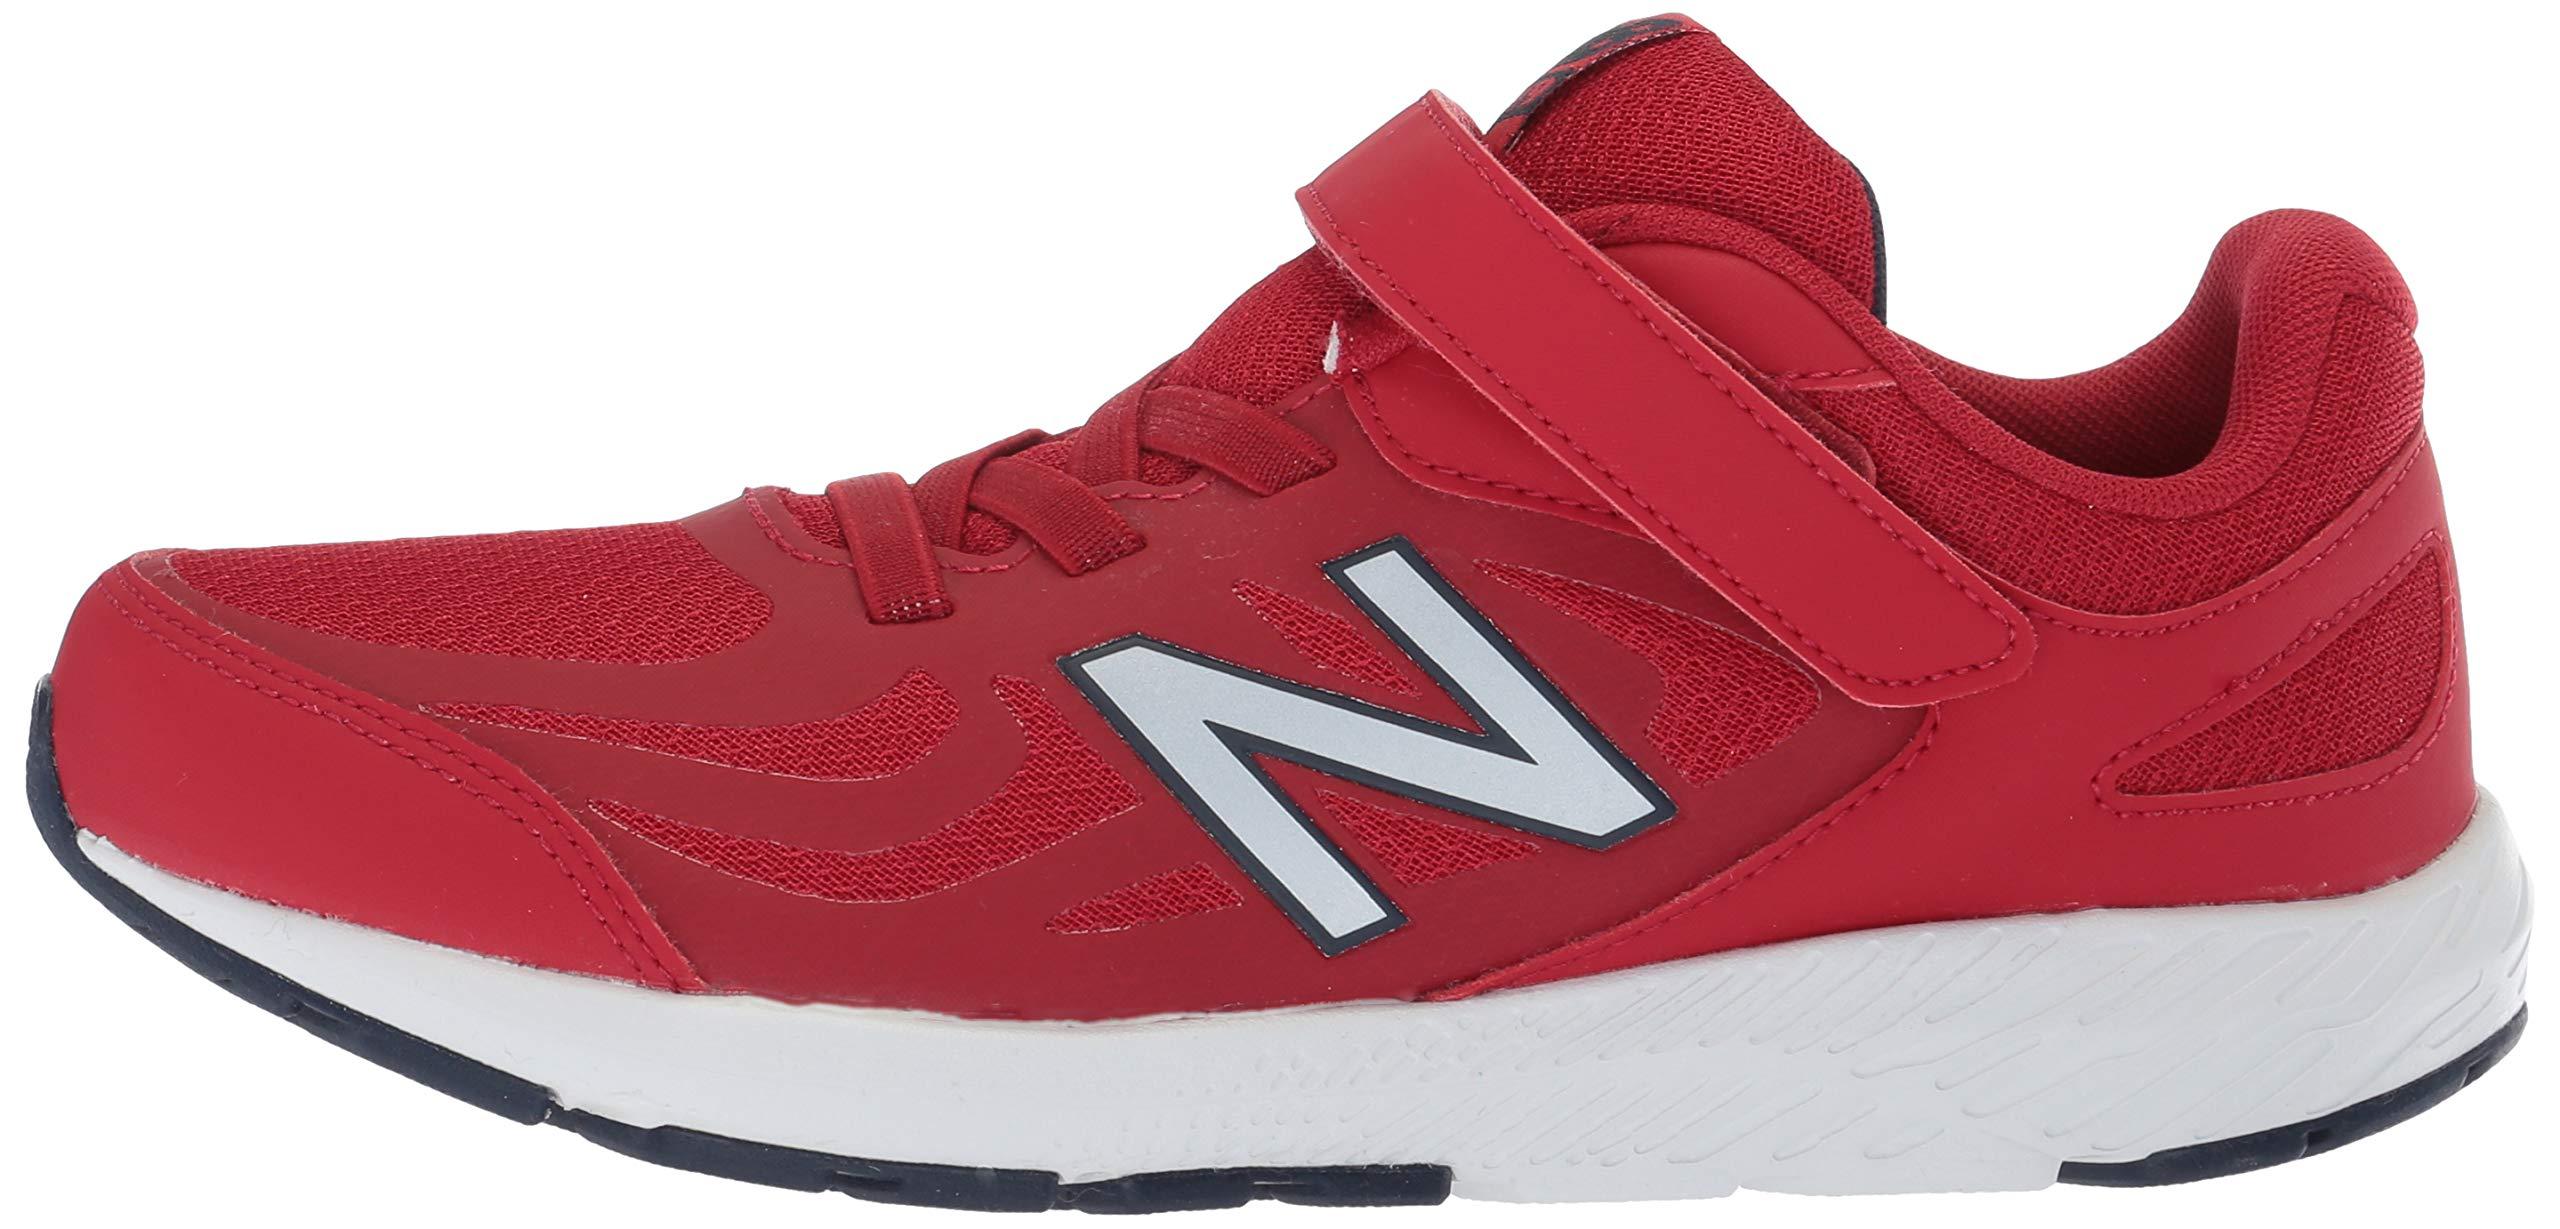 New Balance Boys' 519v1 Hook and Loop Running Shoe, Chili Pepper/Nubuck Scarlet, 2 M US Infant by New Balance (Image #5)